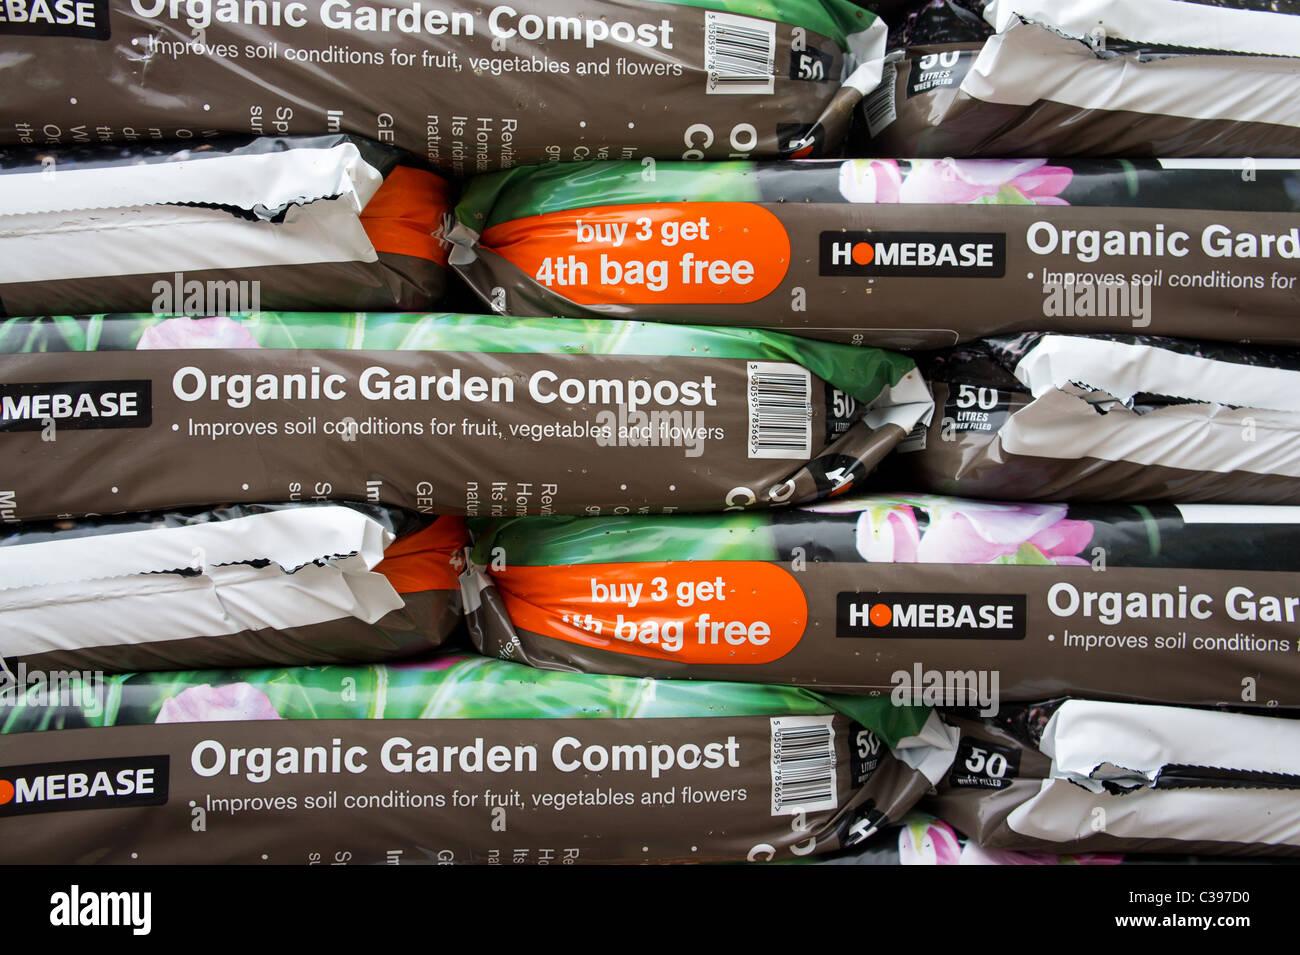 Bags of organic garden compost, uk - Stock Image